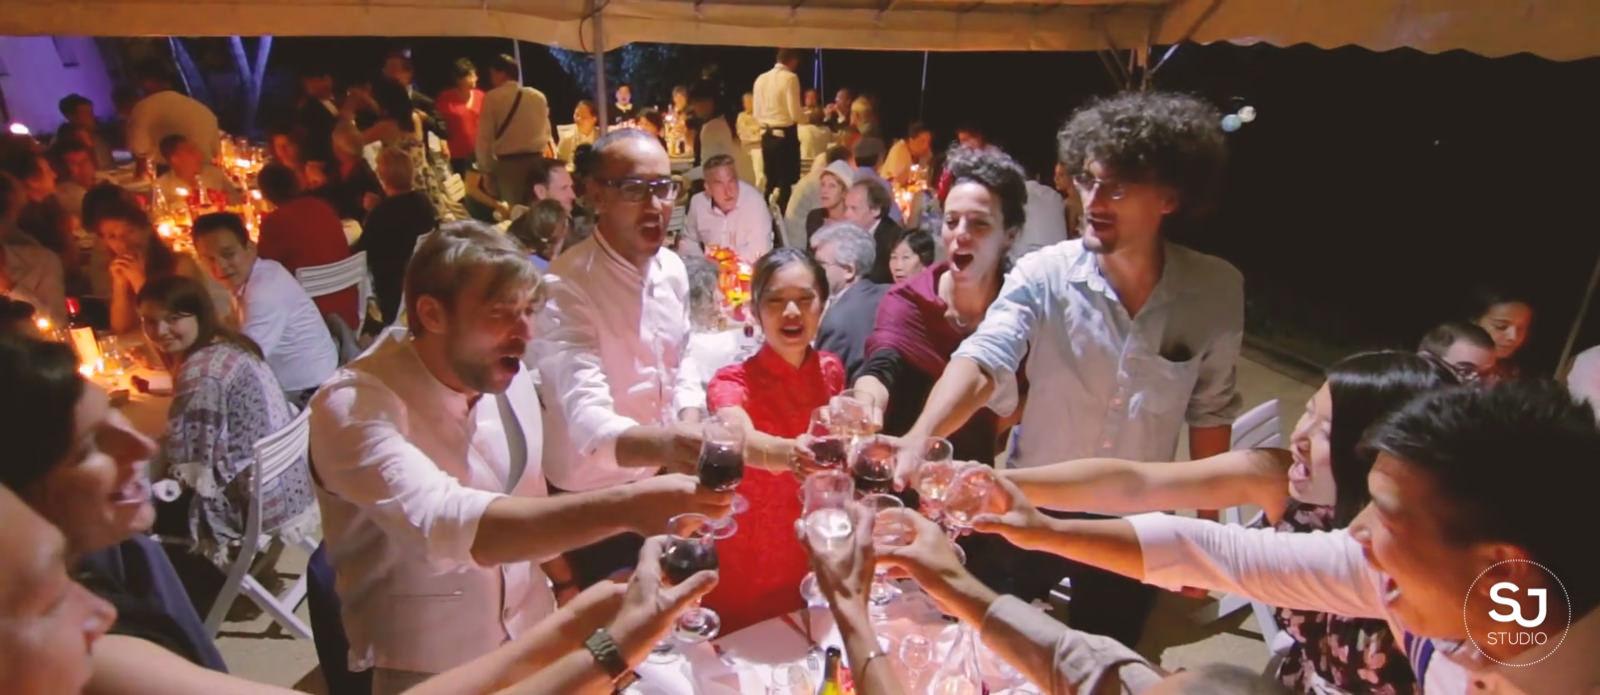 film-de-mariage-marseille-domaine-gros-driou-sj-studio-sebastien-cabanes-21